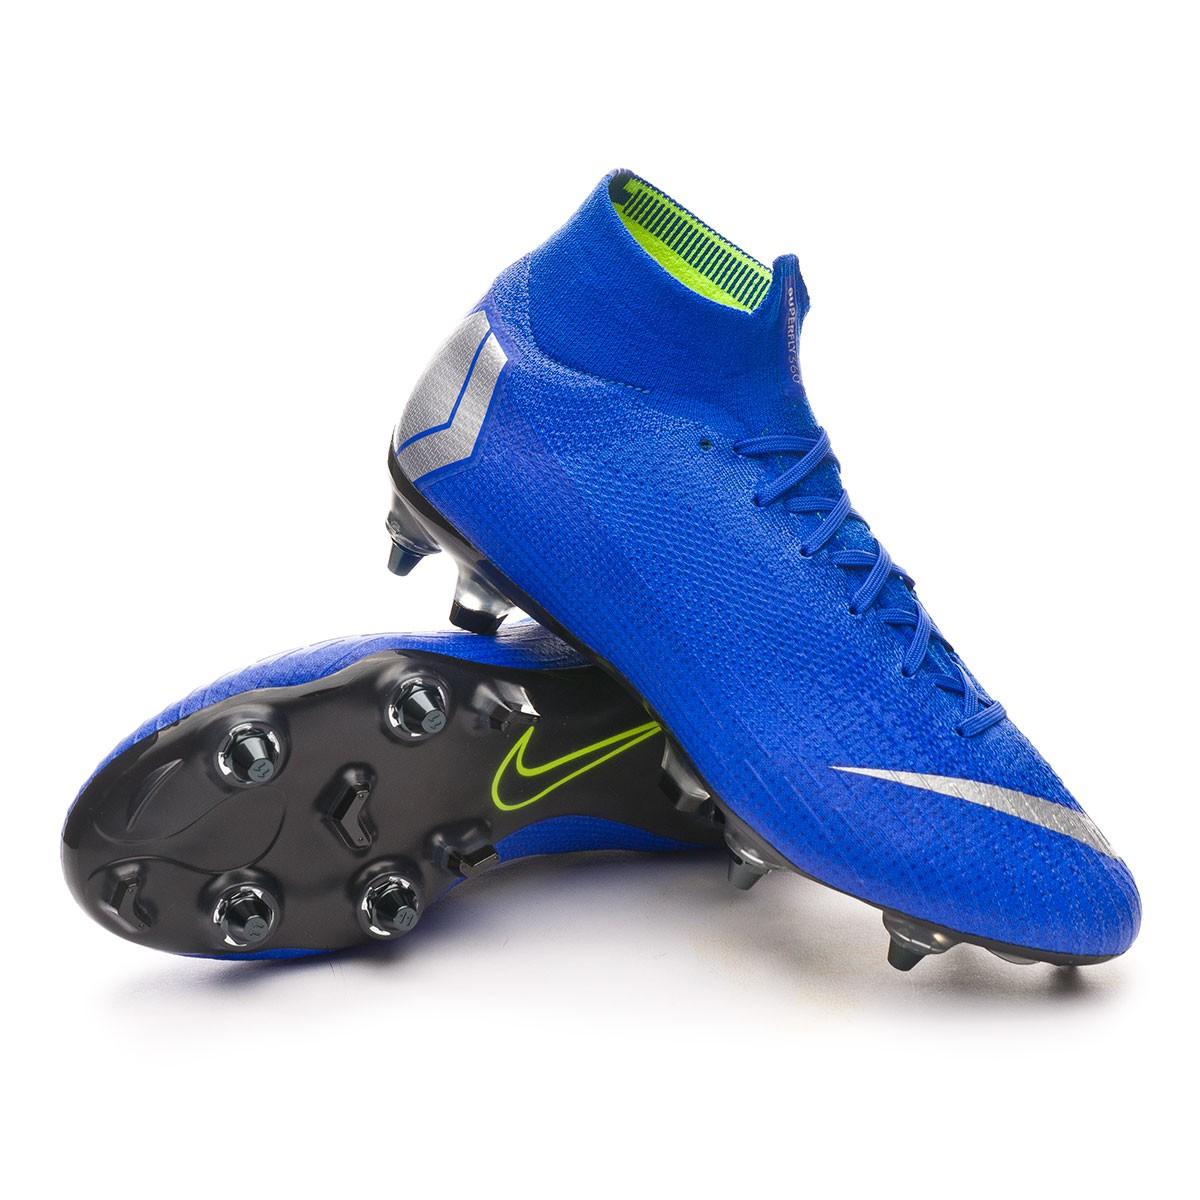 buy online b5192 66ae1 Football Boots Nike Mercurial Superfly VI Elite Anti-Clog SG-Pro Racer blue-Matallic  silver-Black - Tienda de fútbol Fútbol Emotion